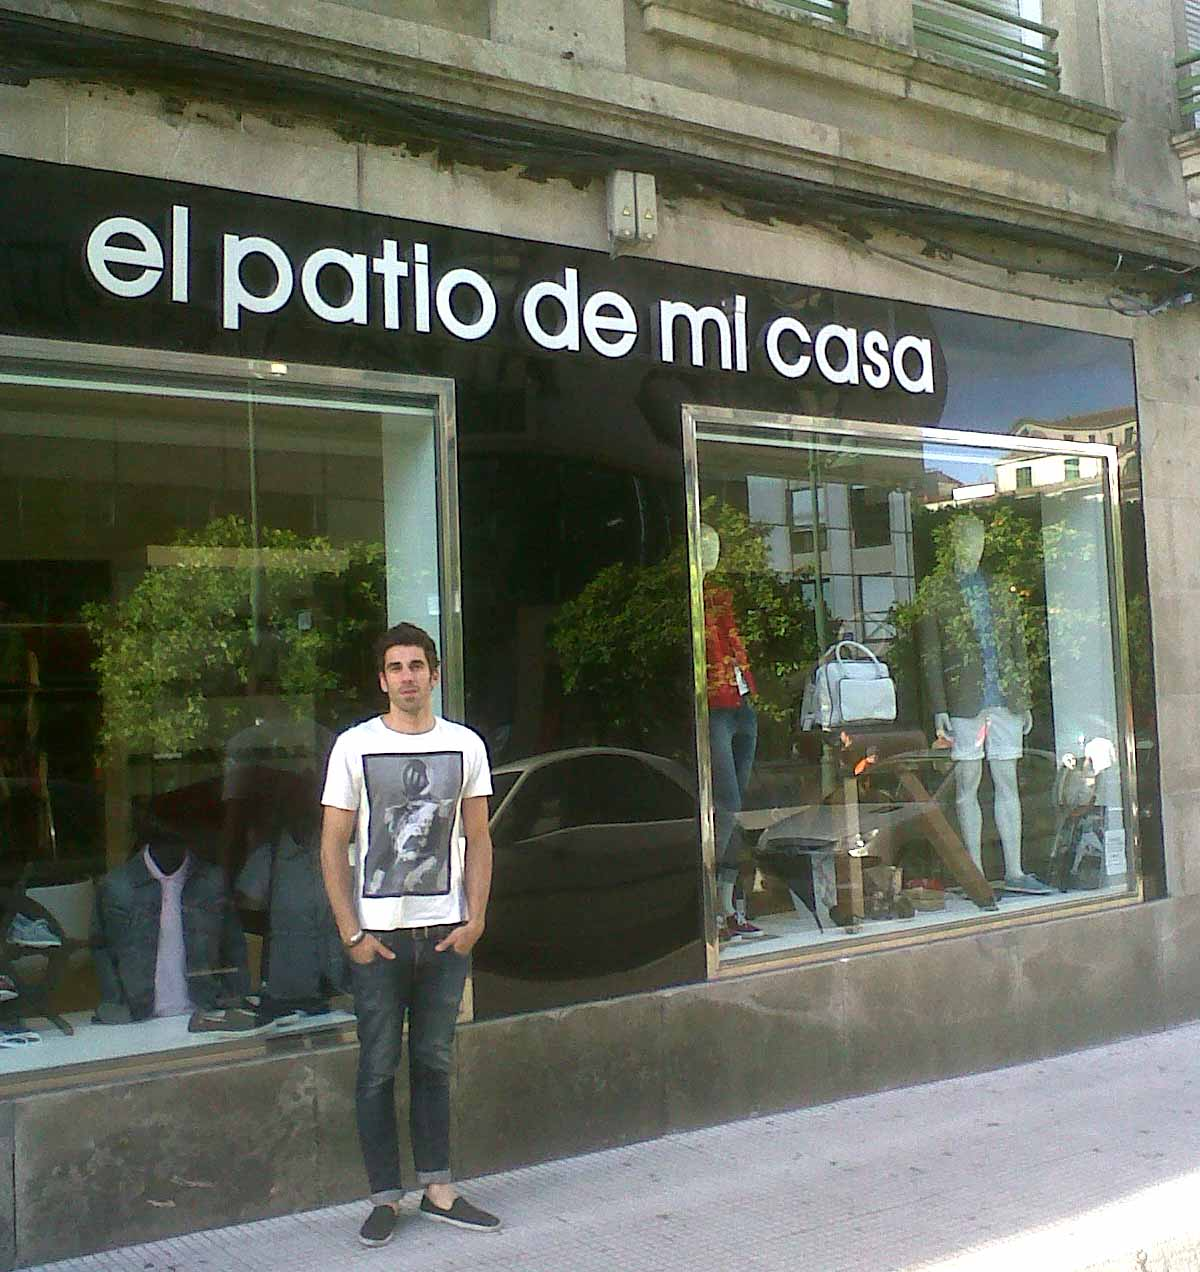 Roman padin blog el patio de mi casa pontevedra - Mi casa pontevedra ...